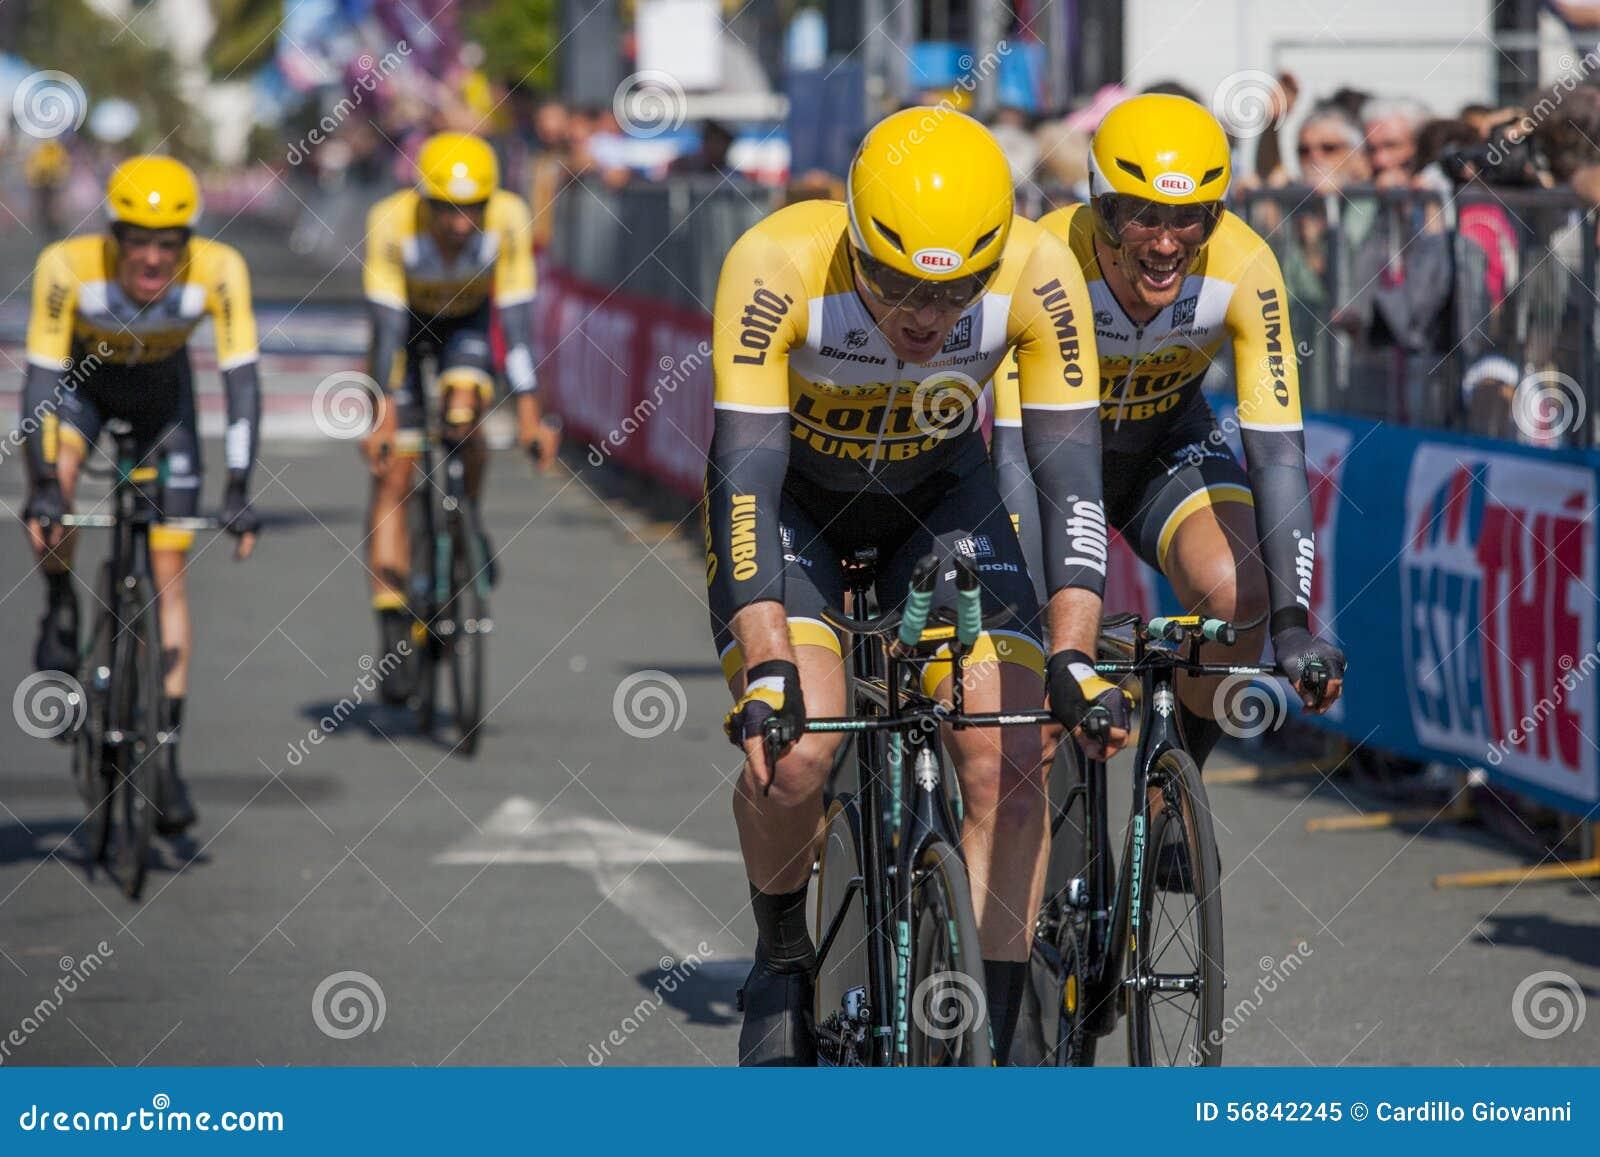 98° Giro D Italia